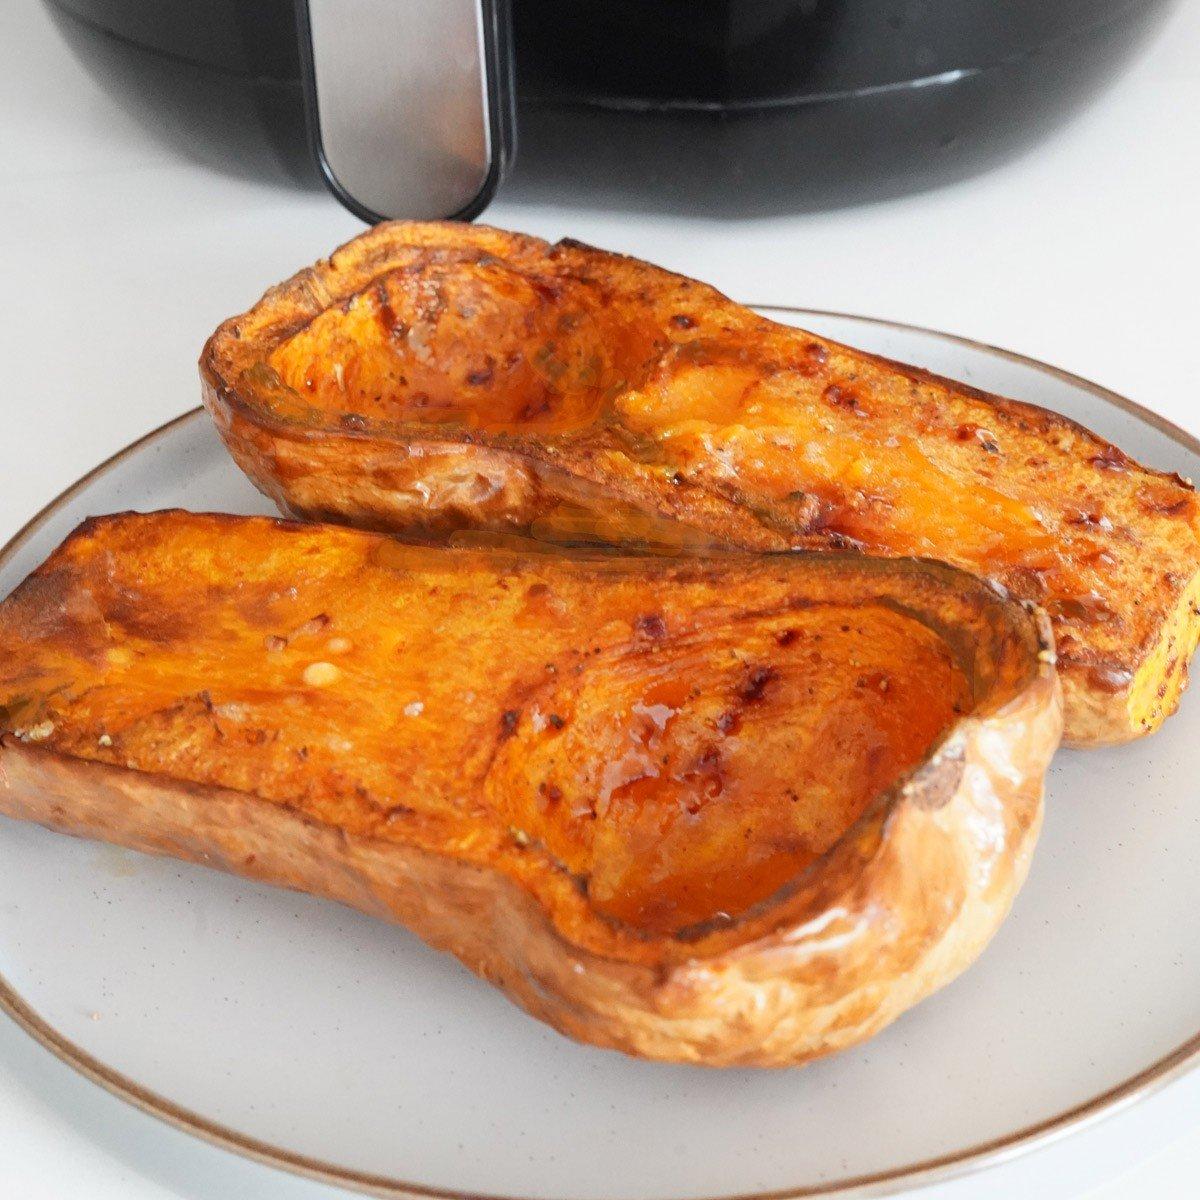 Air Fryer Butternut Squash (Halves)